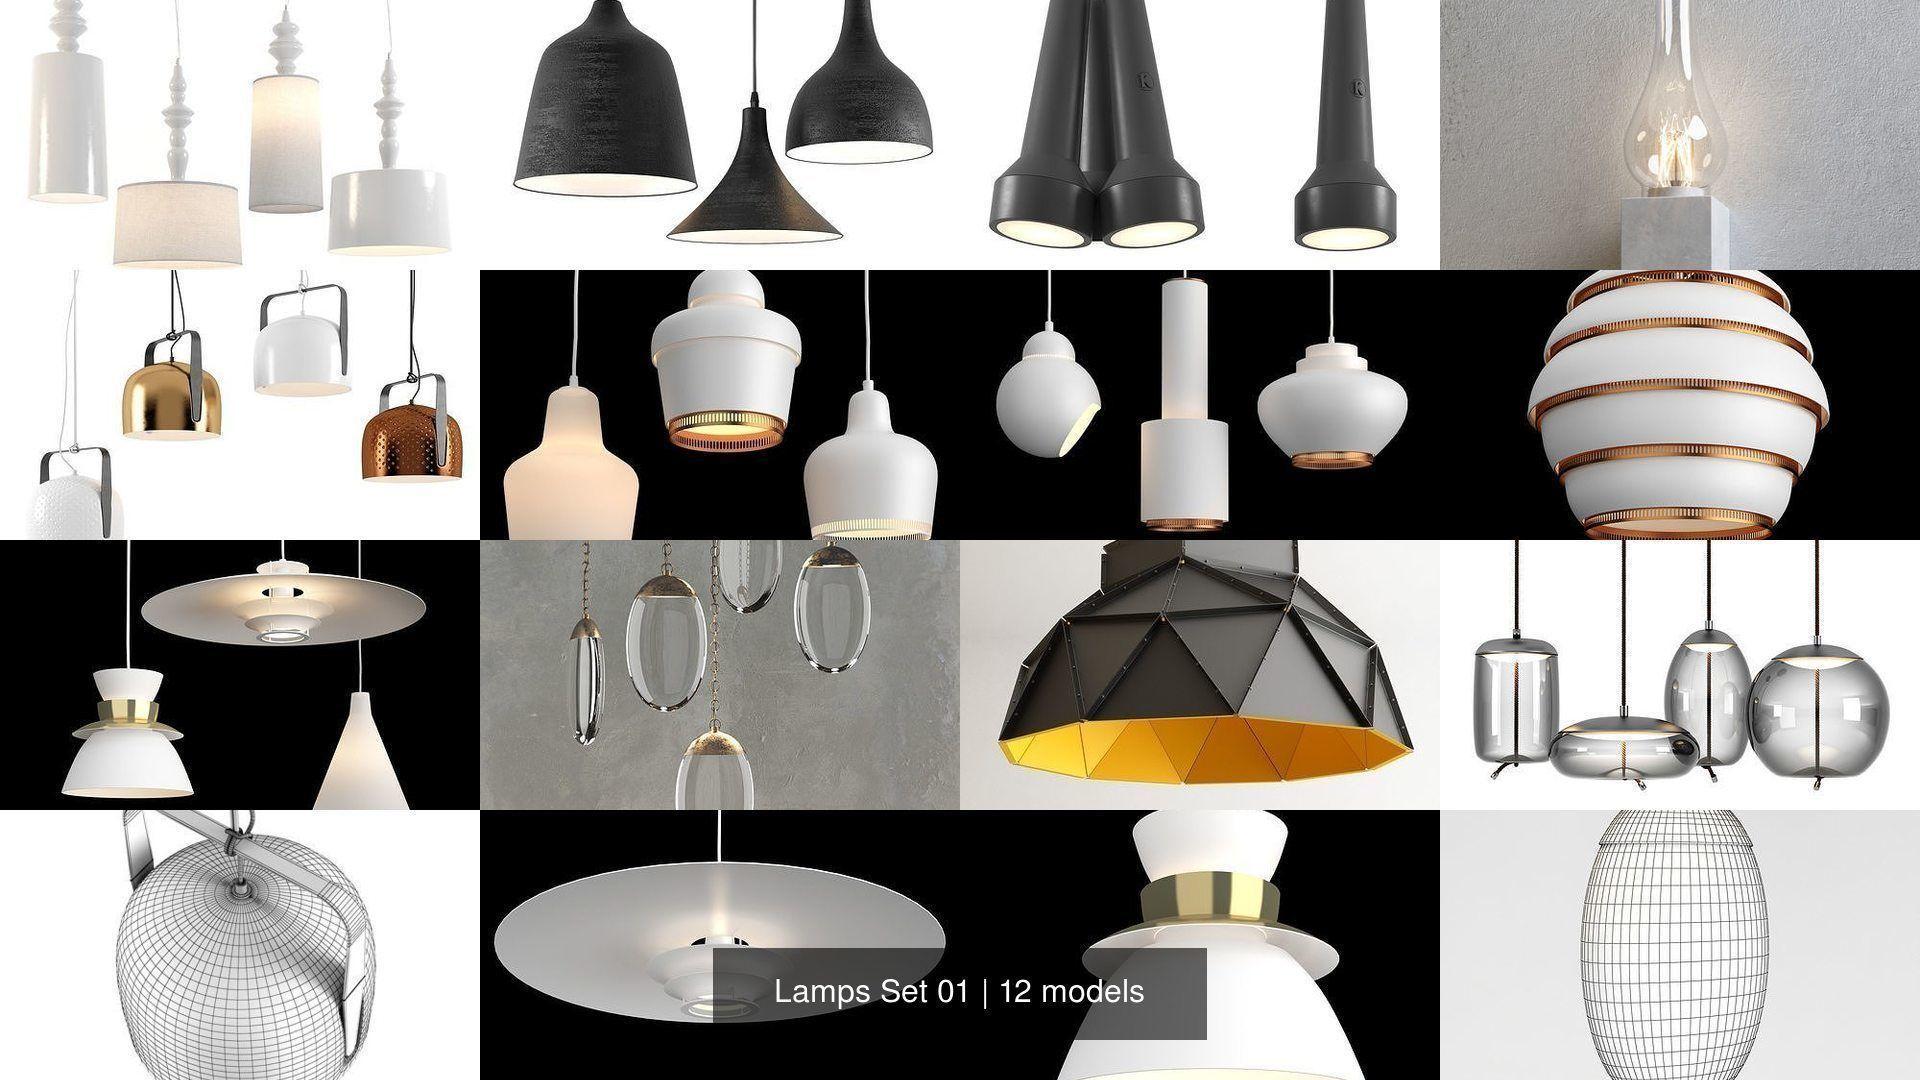 3d Model Lamps Set 01 Restaurant Cgtrader